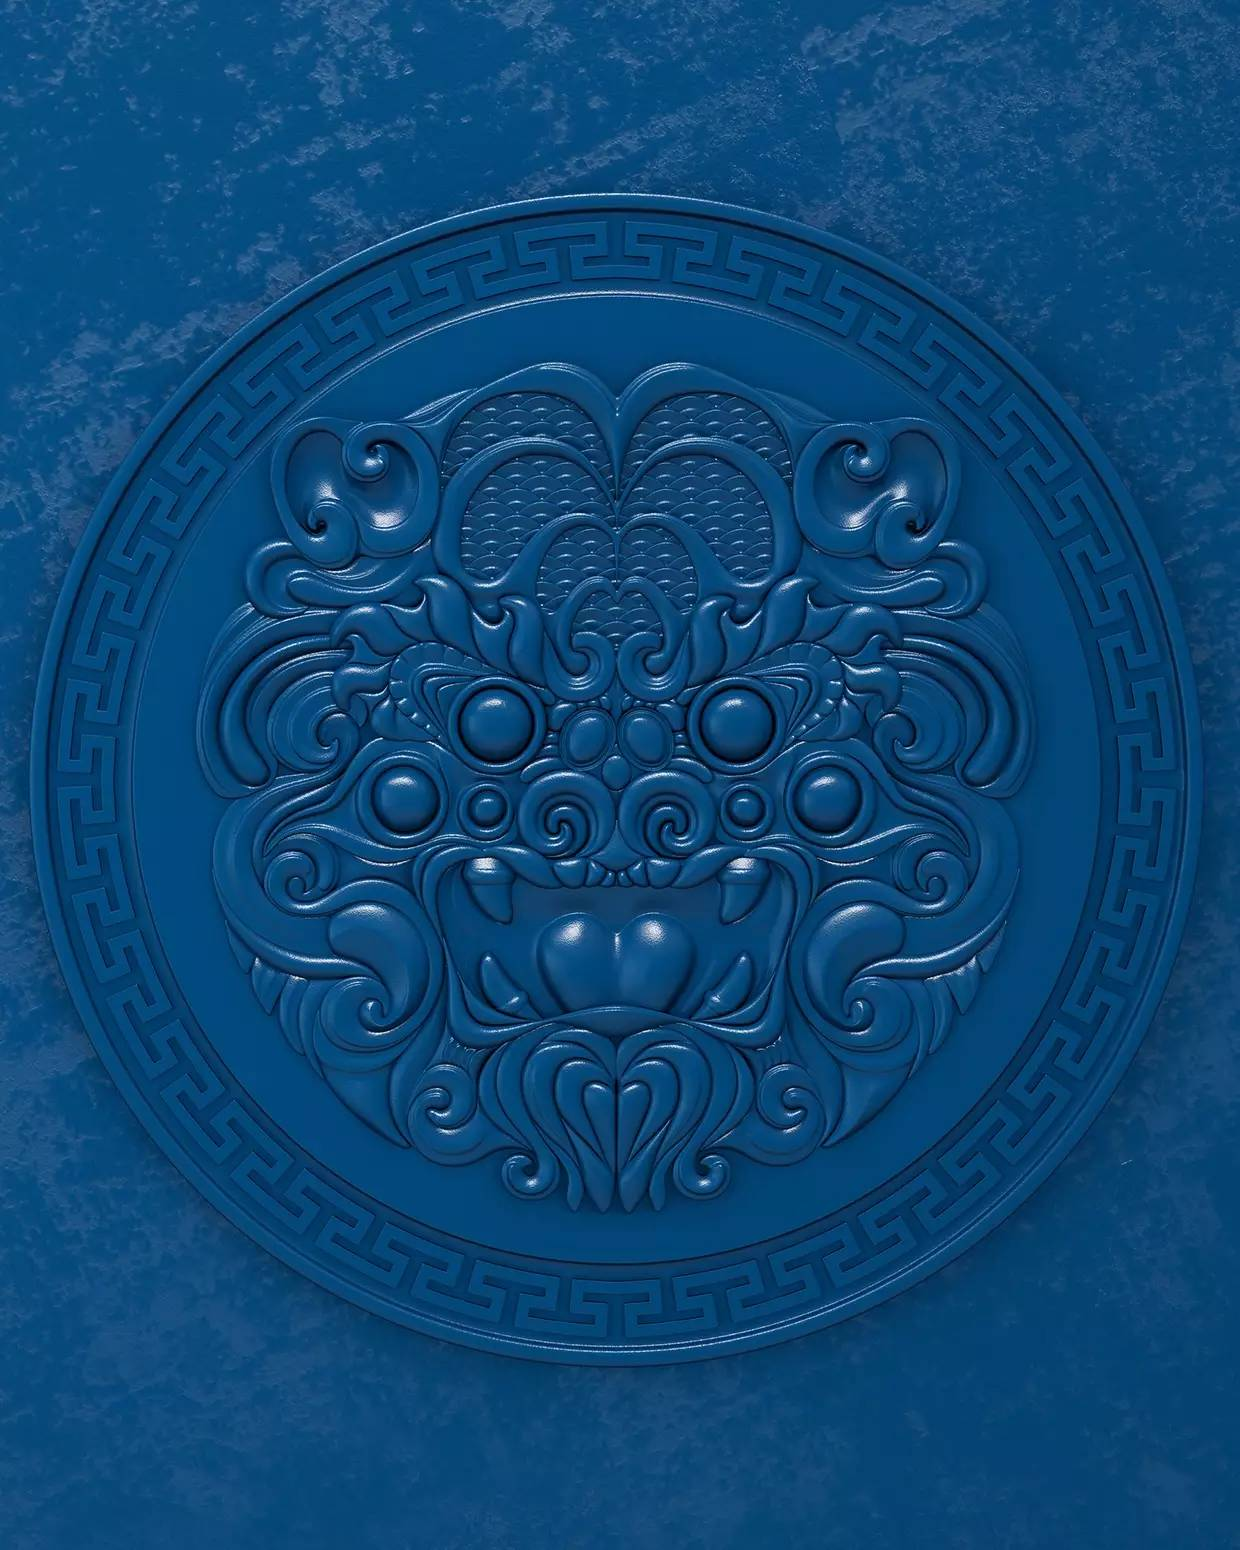 室内设计|蒙族传统装饰(Mongolian Traditional Ornament) 第15张